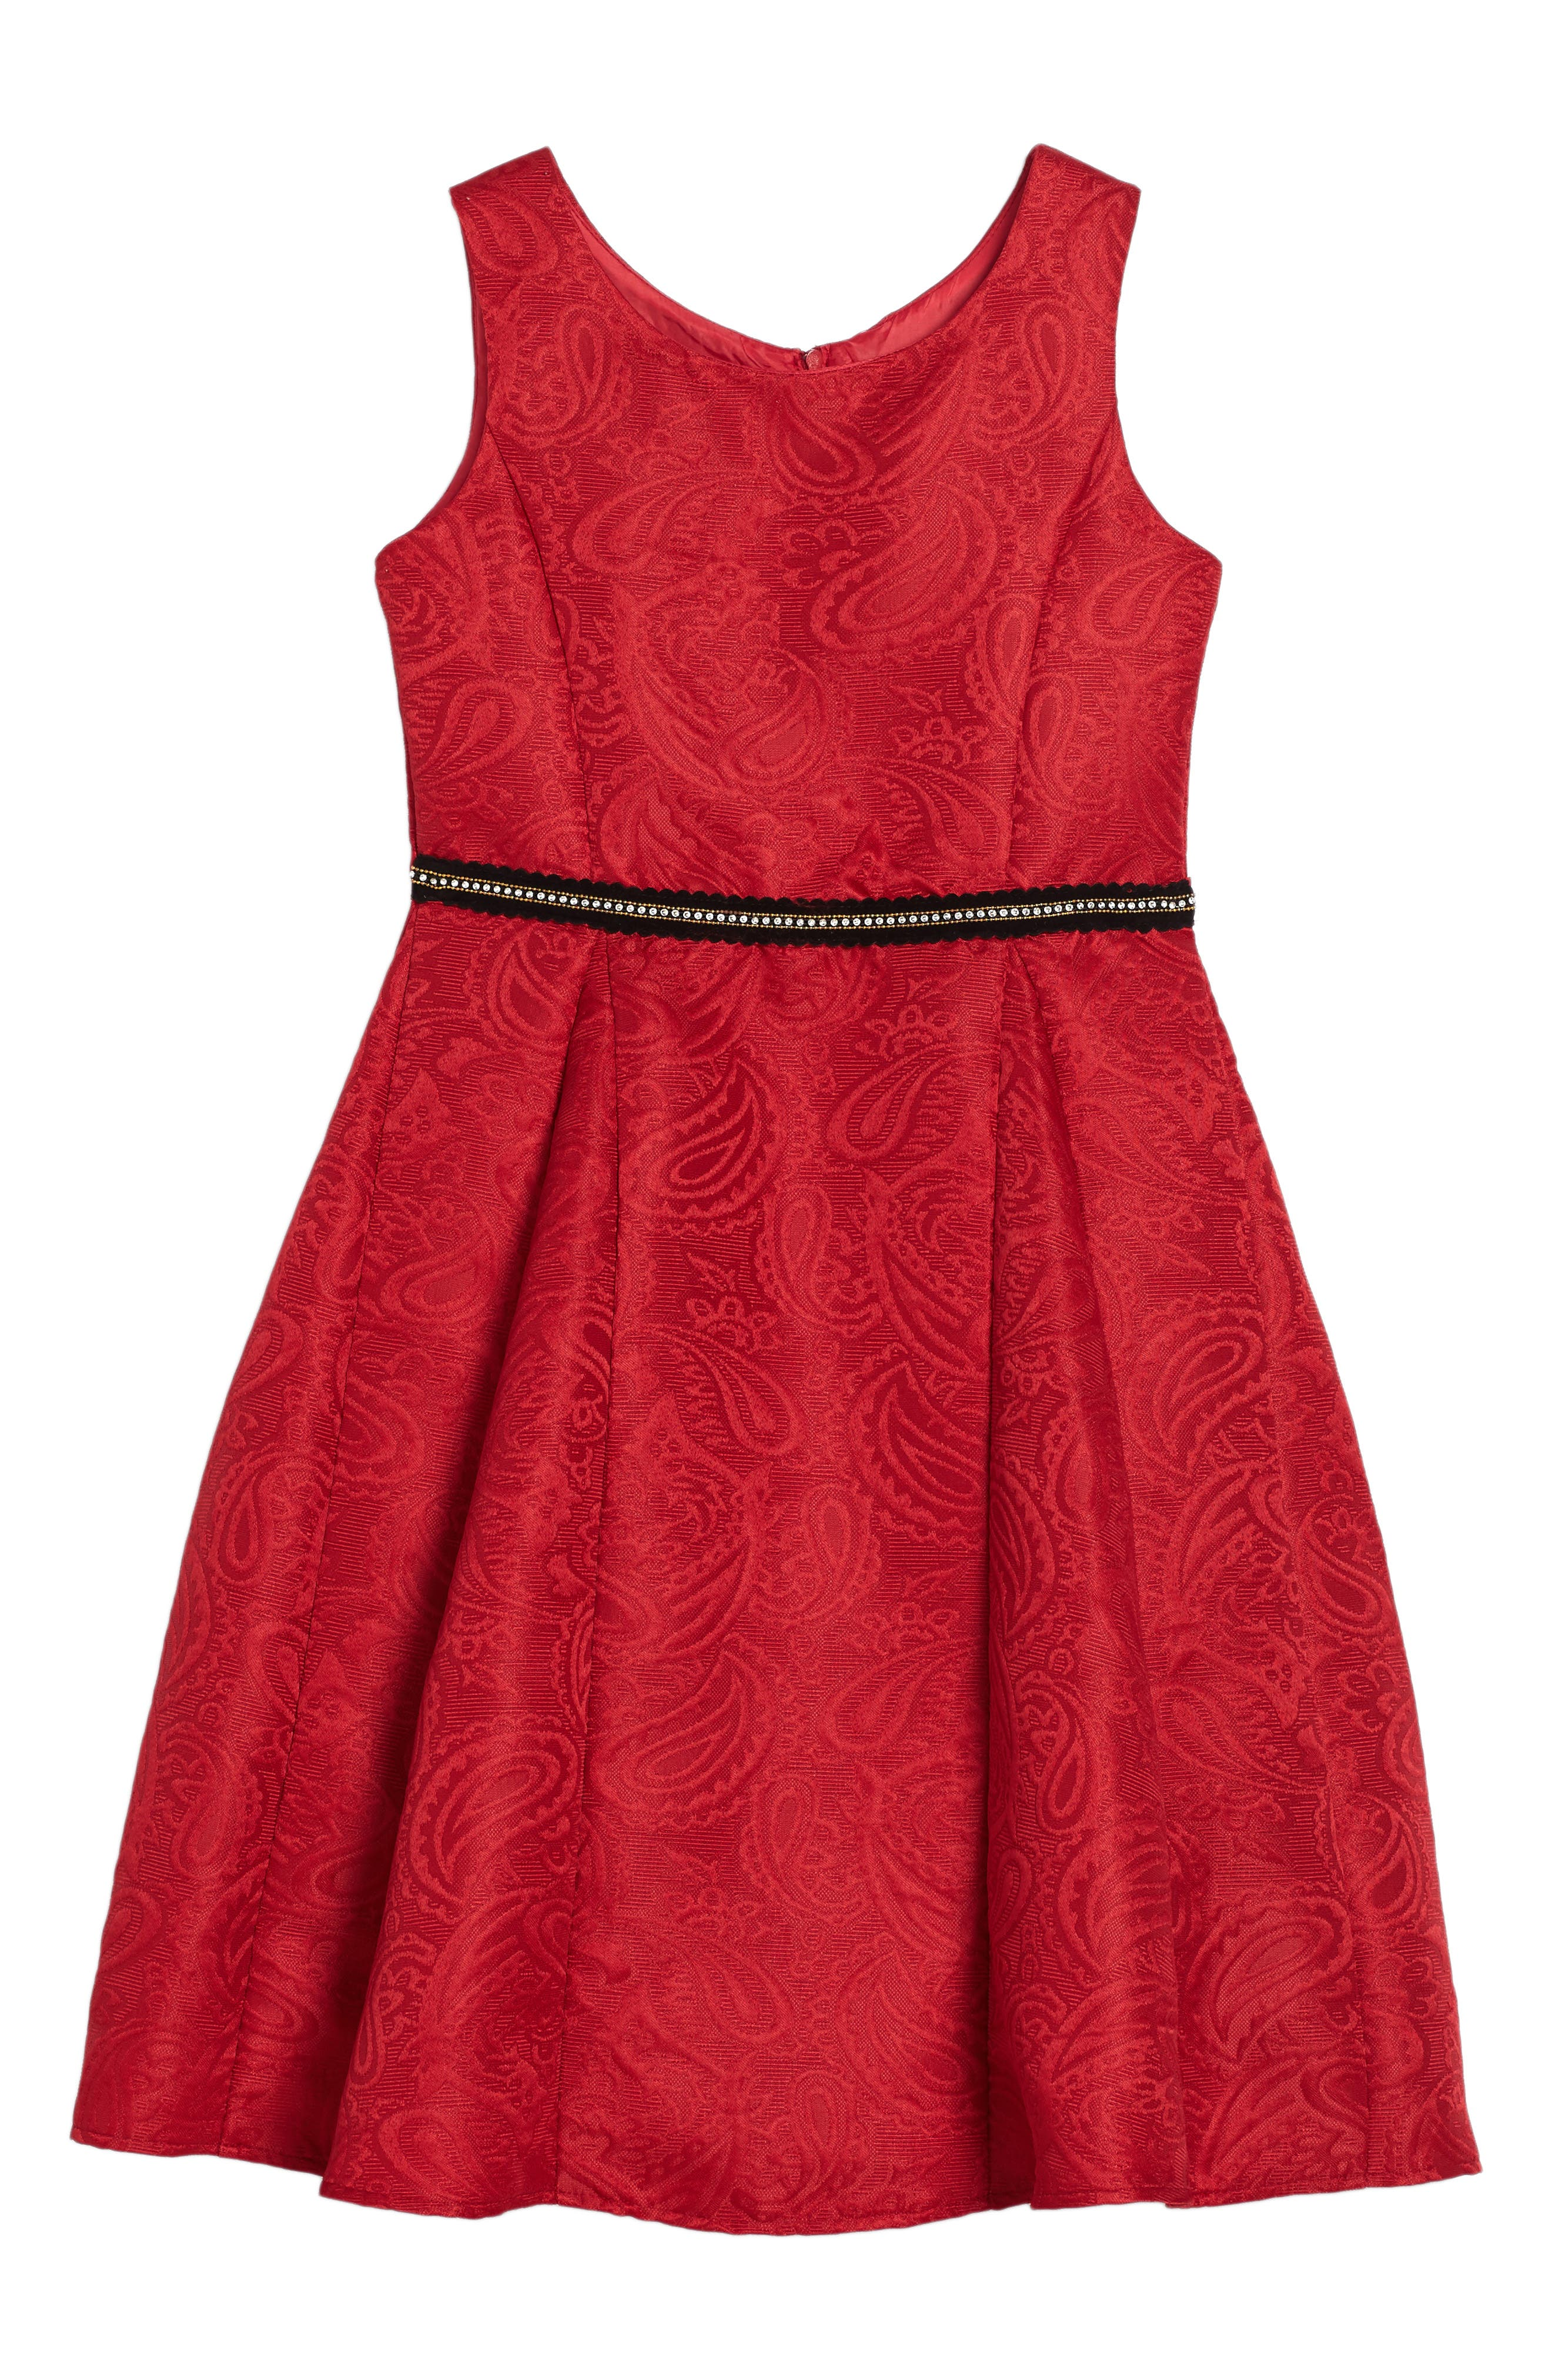 Hannah Jacquard Dress,                         Main,                         color, 600